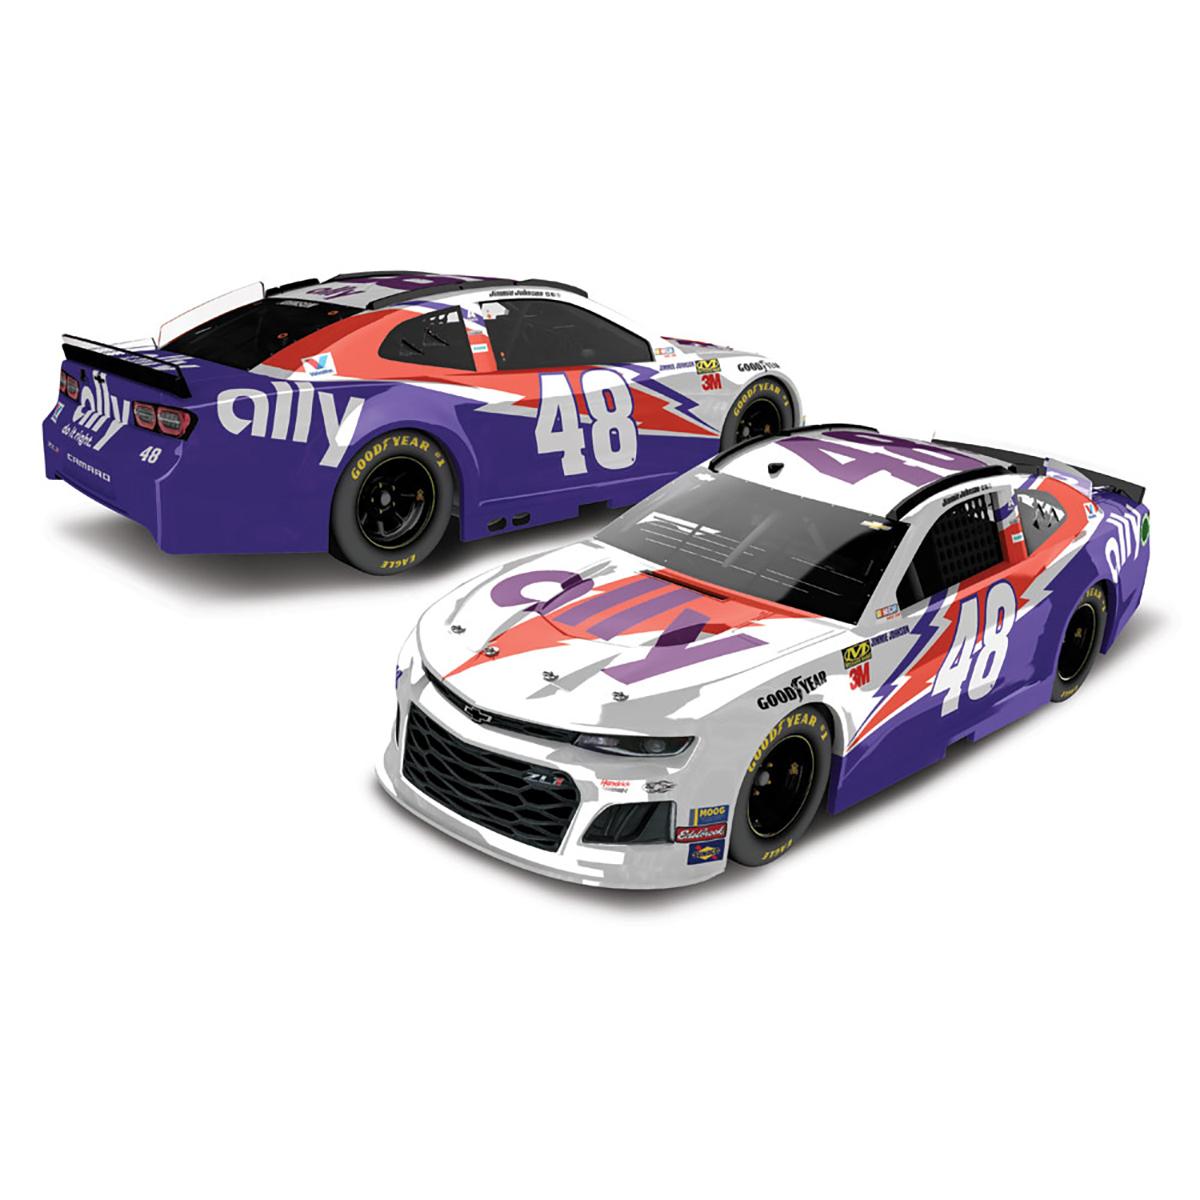 Jimmie Johnson #48 2019 Ally Darlington NASCAR HO 1:24 - Die Cast